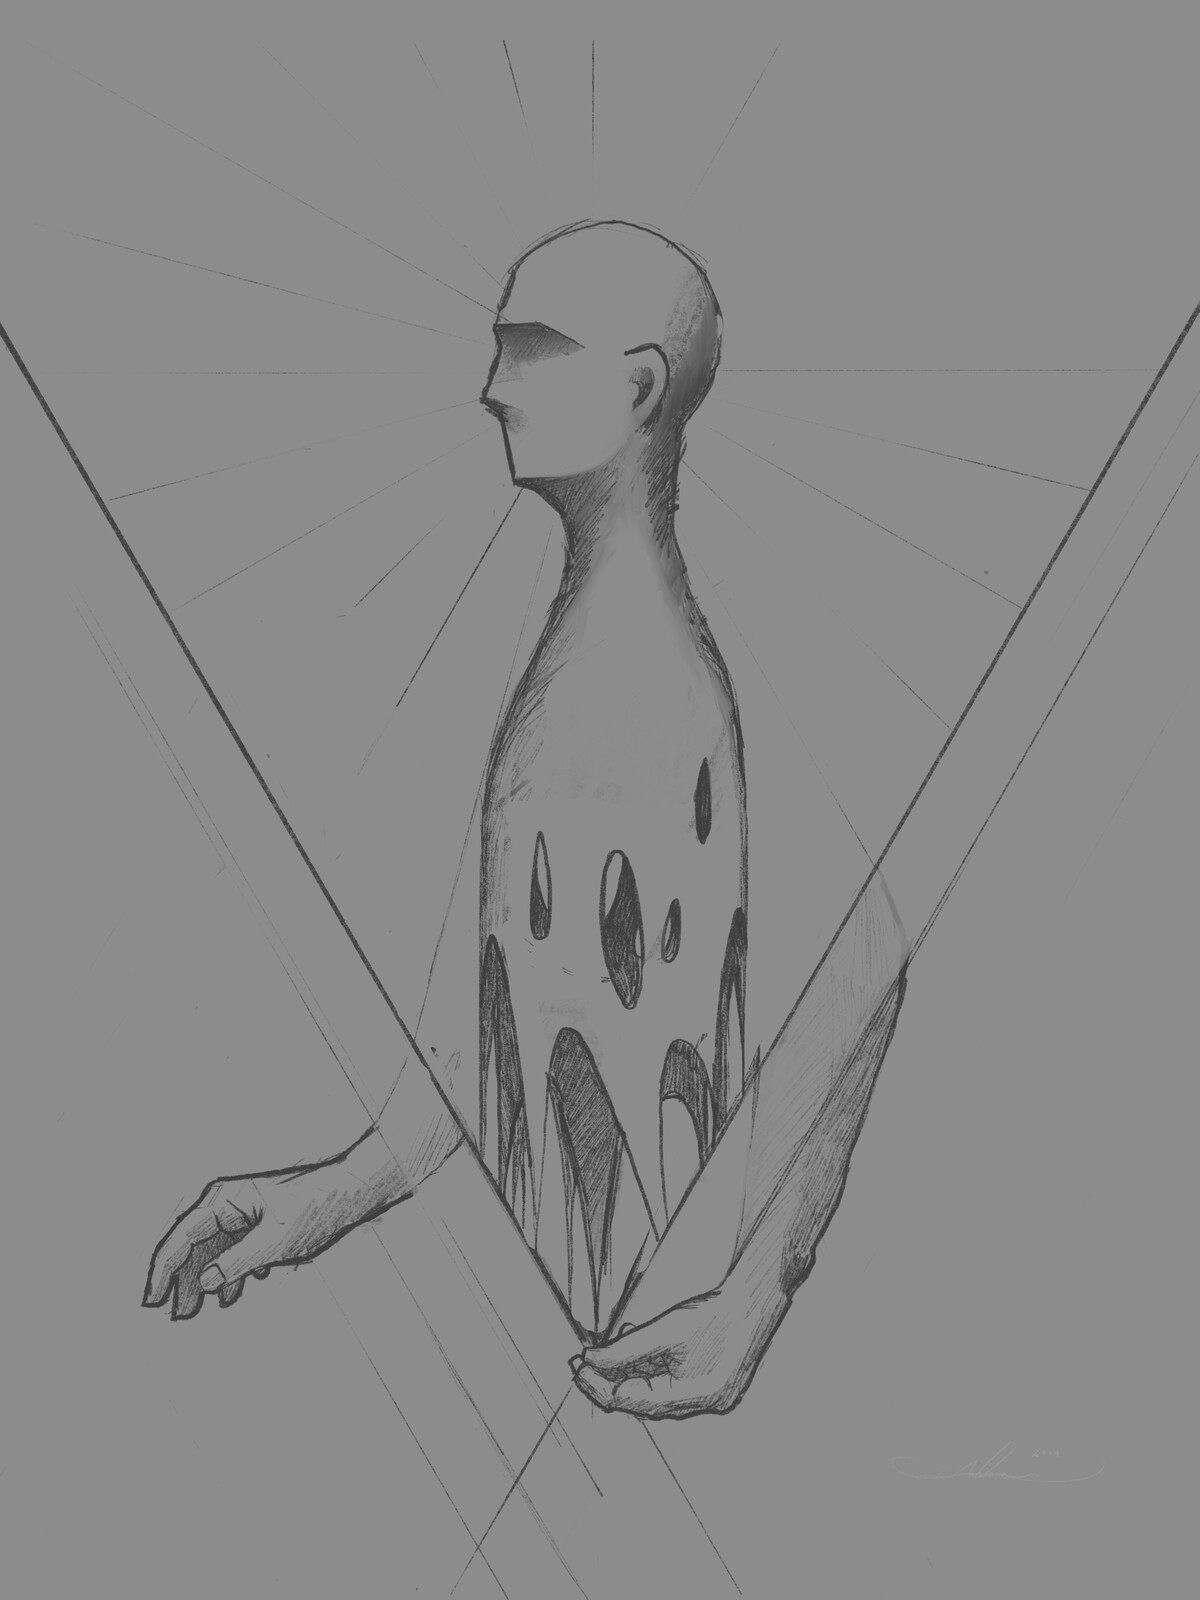 v.2 sketch